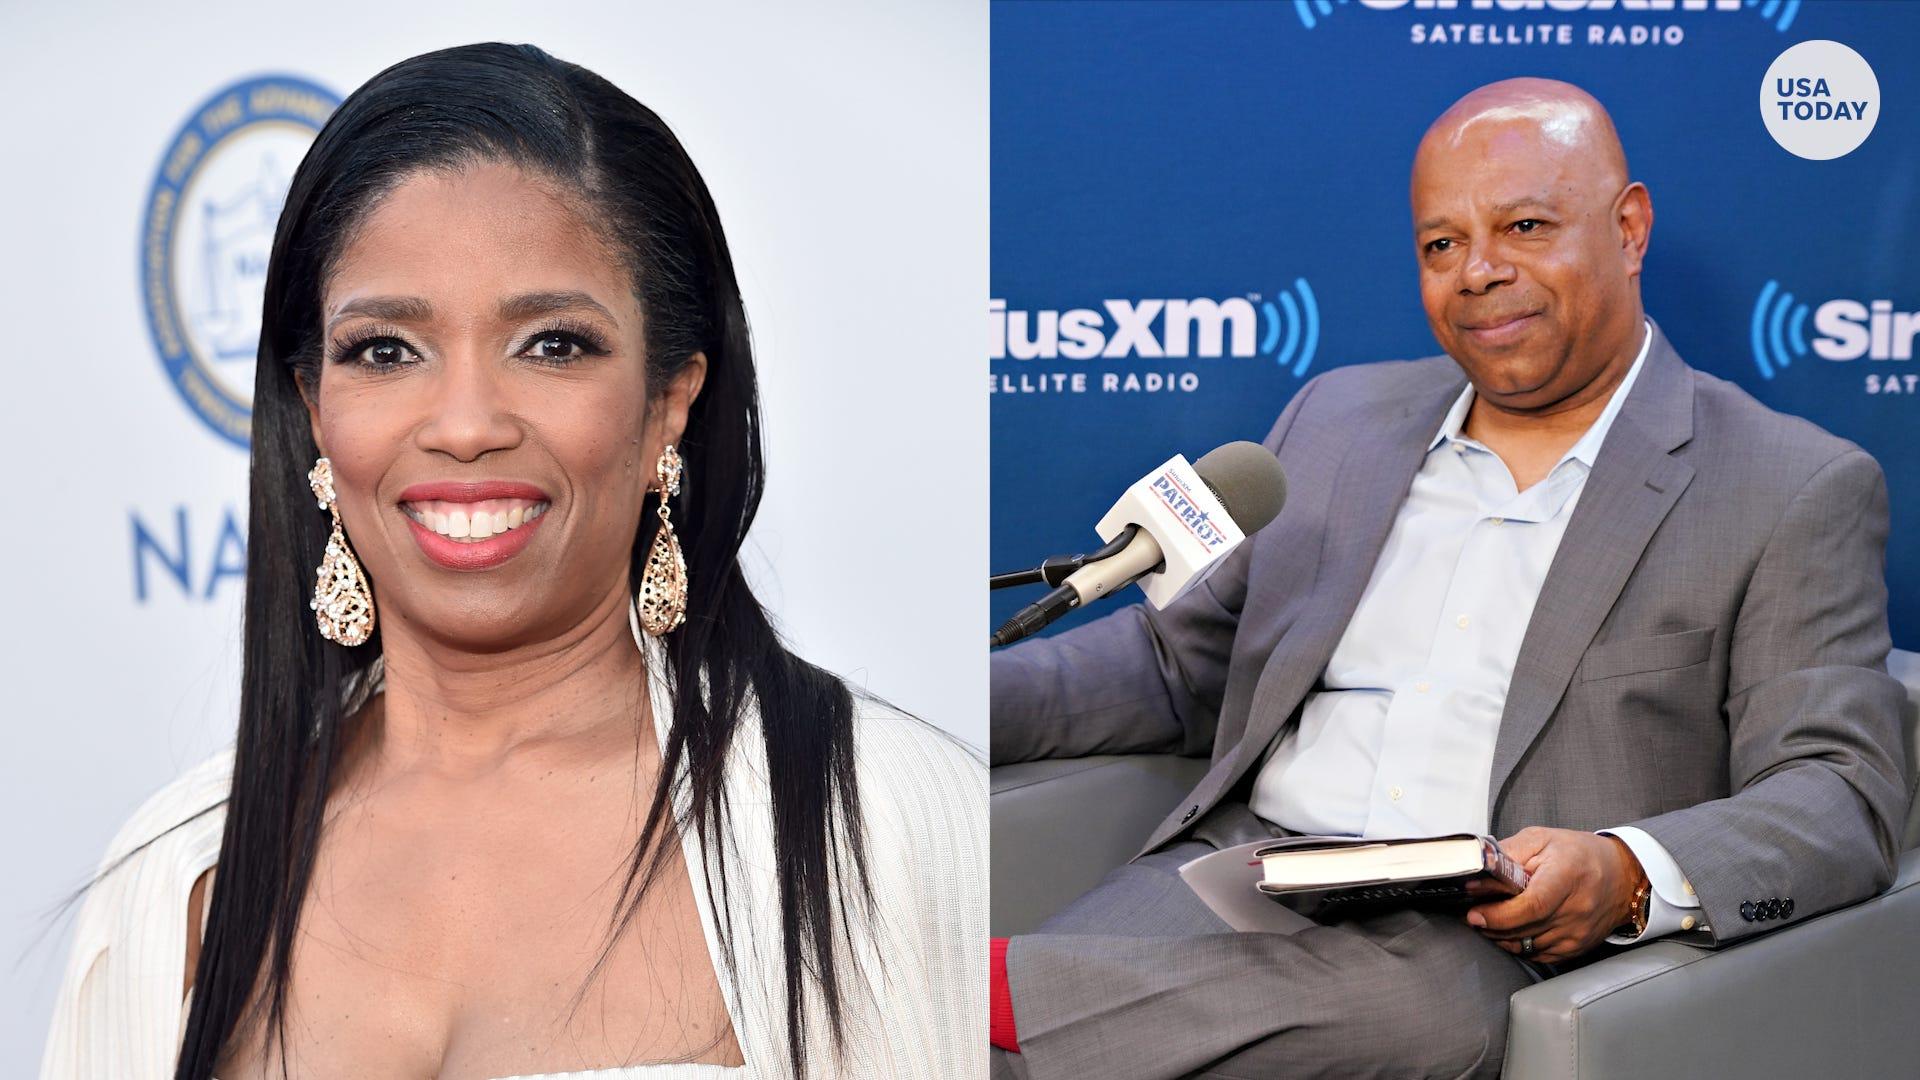 Areva Martin: CNN analyst accuses black radio host of white